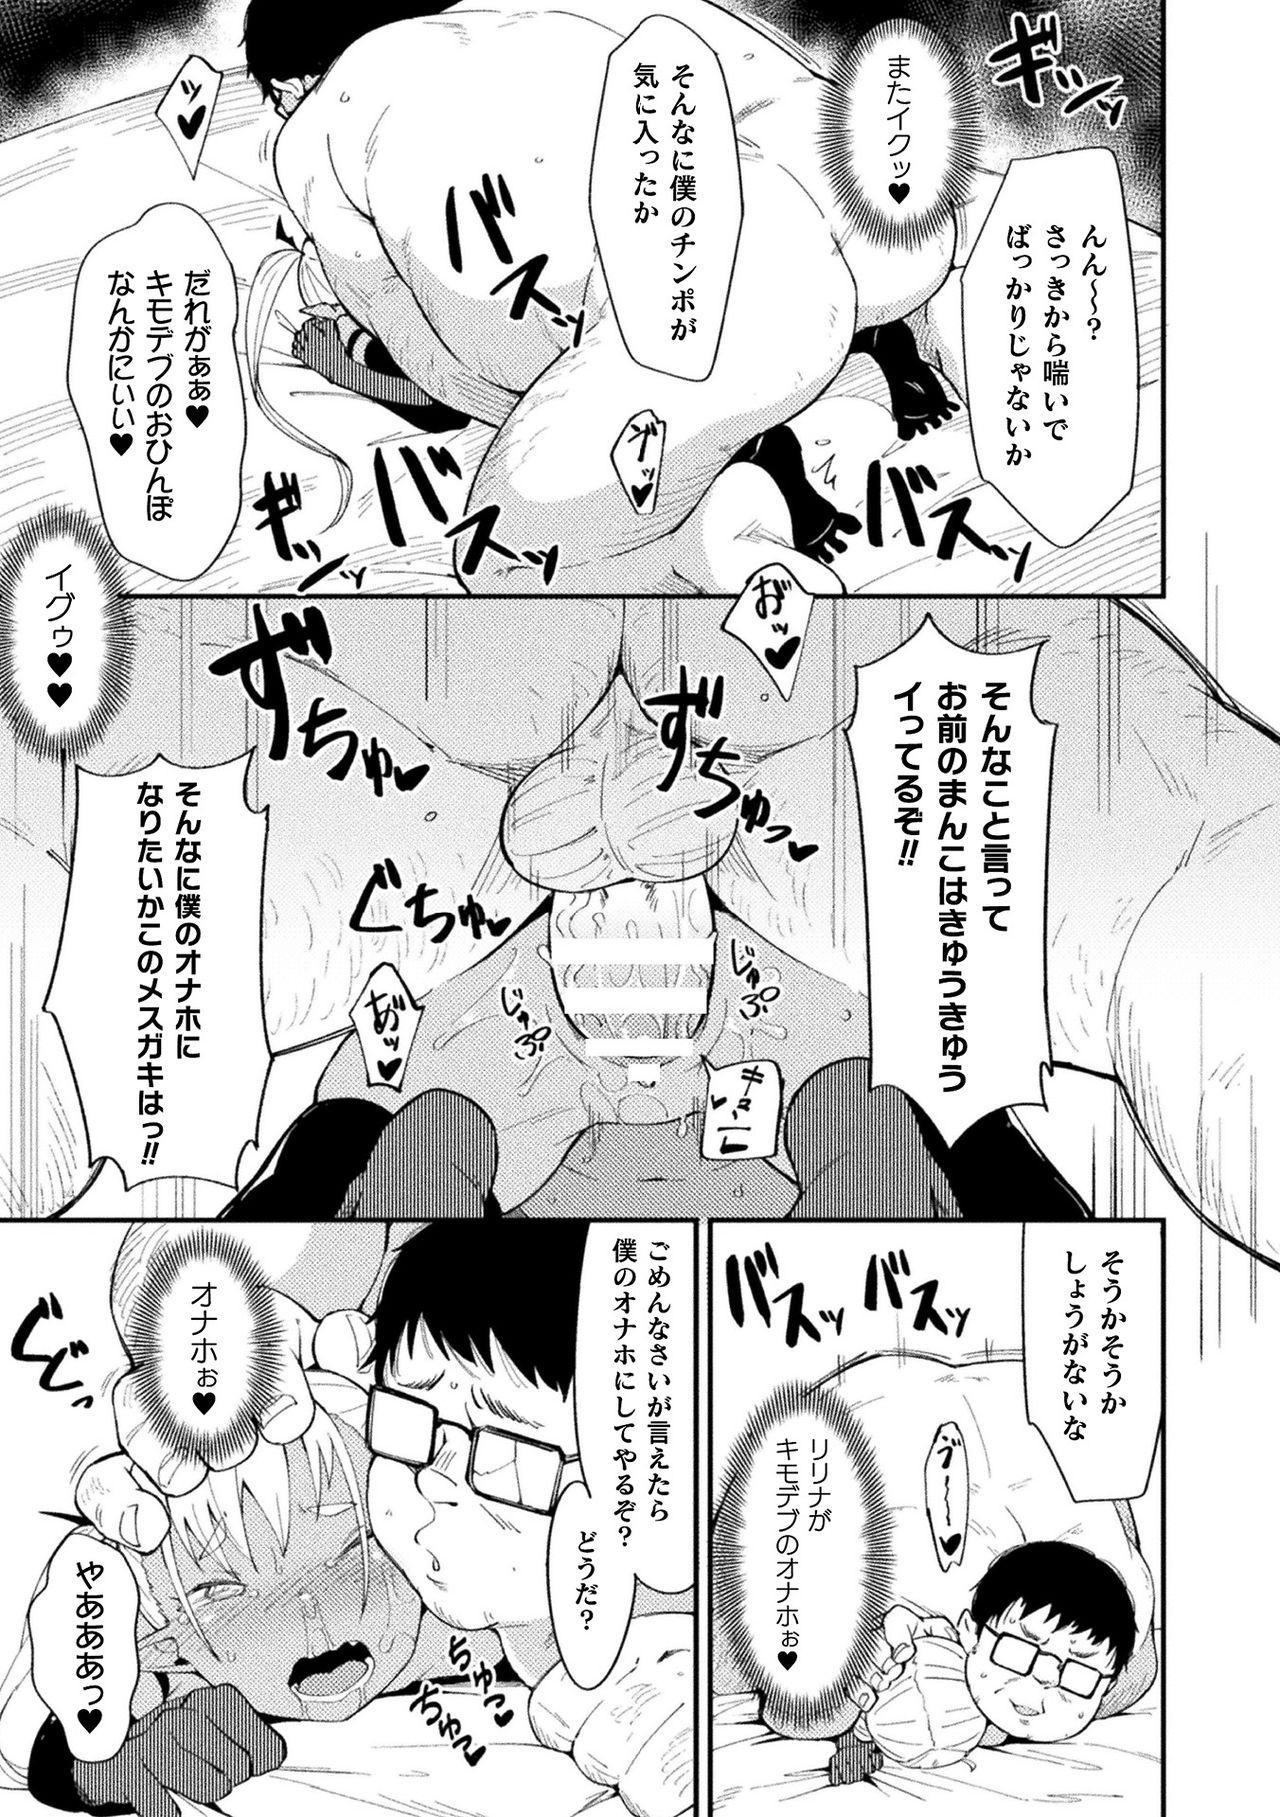 [Anthology] 2D Comic Magazine Mesugaki Succubus Seisai Namaiki Aka-chan Heya o Wakarase-bou de Kousei Knock Vol. 2 [Digital] 38